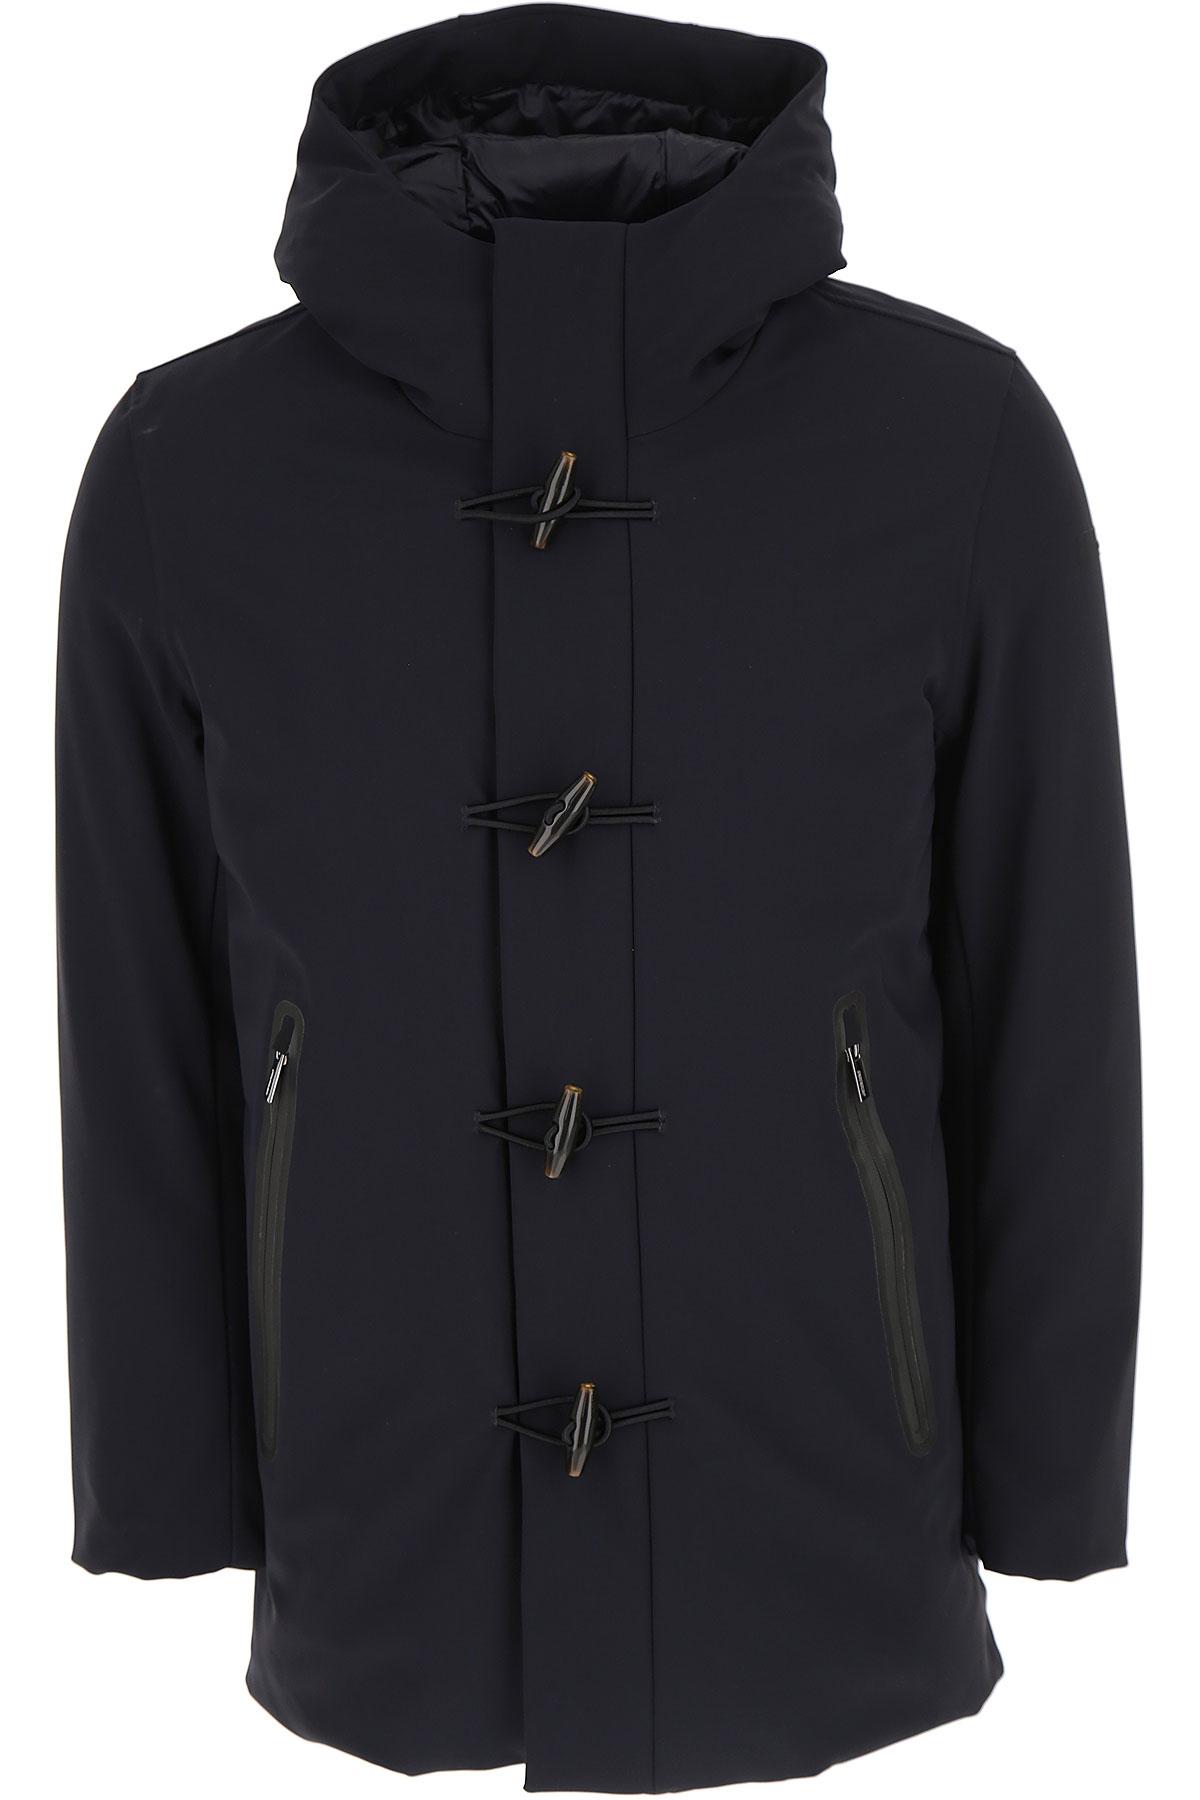 Image of RRD Down Jacket for Men, Puffer Ski Jacket, Ink Blue, polyester, 2017, L M XL XXL